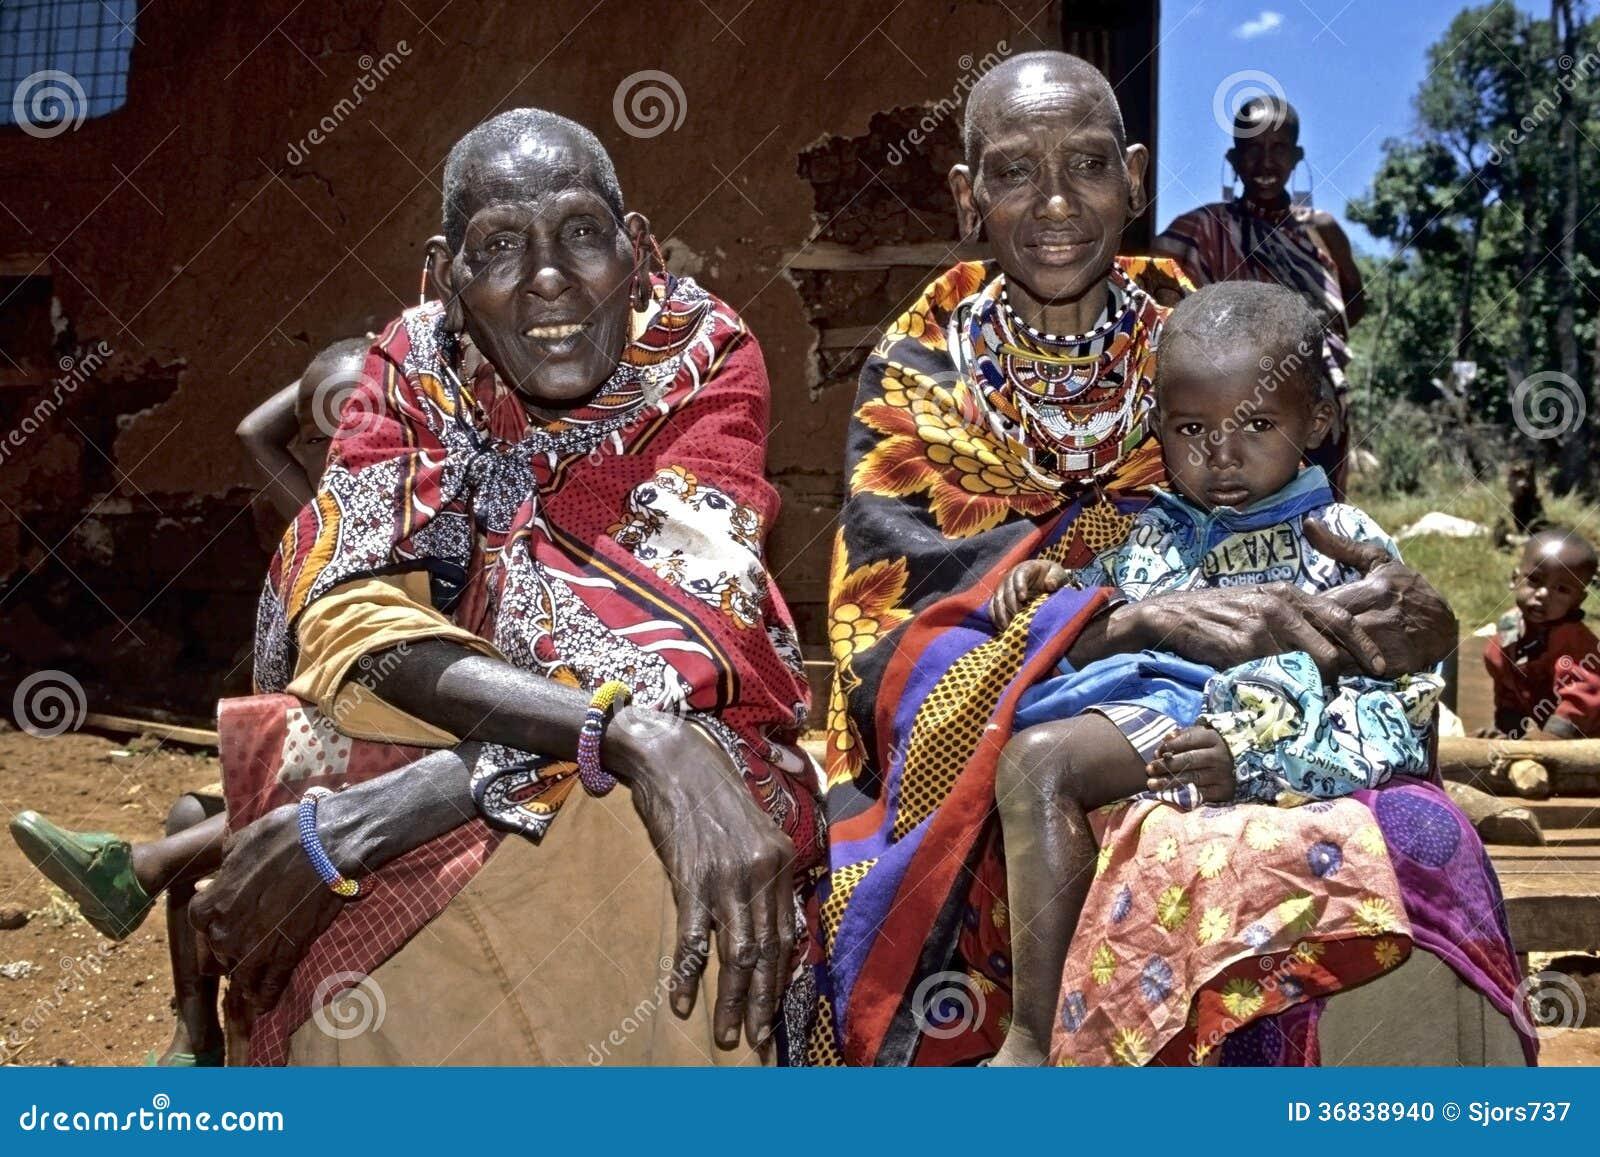 group portrait maasai grandmothers and grandchild